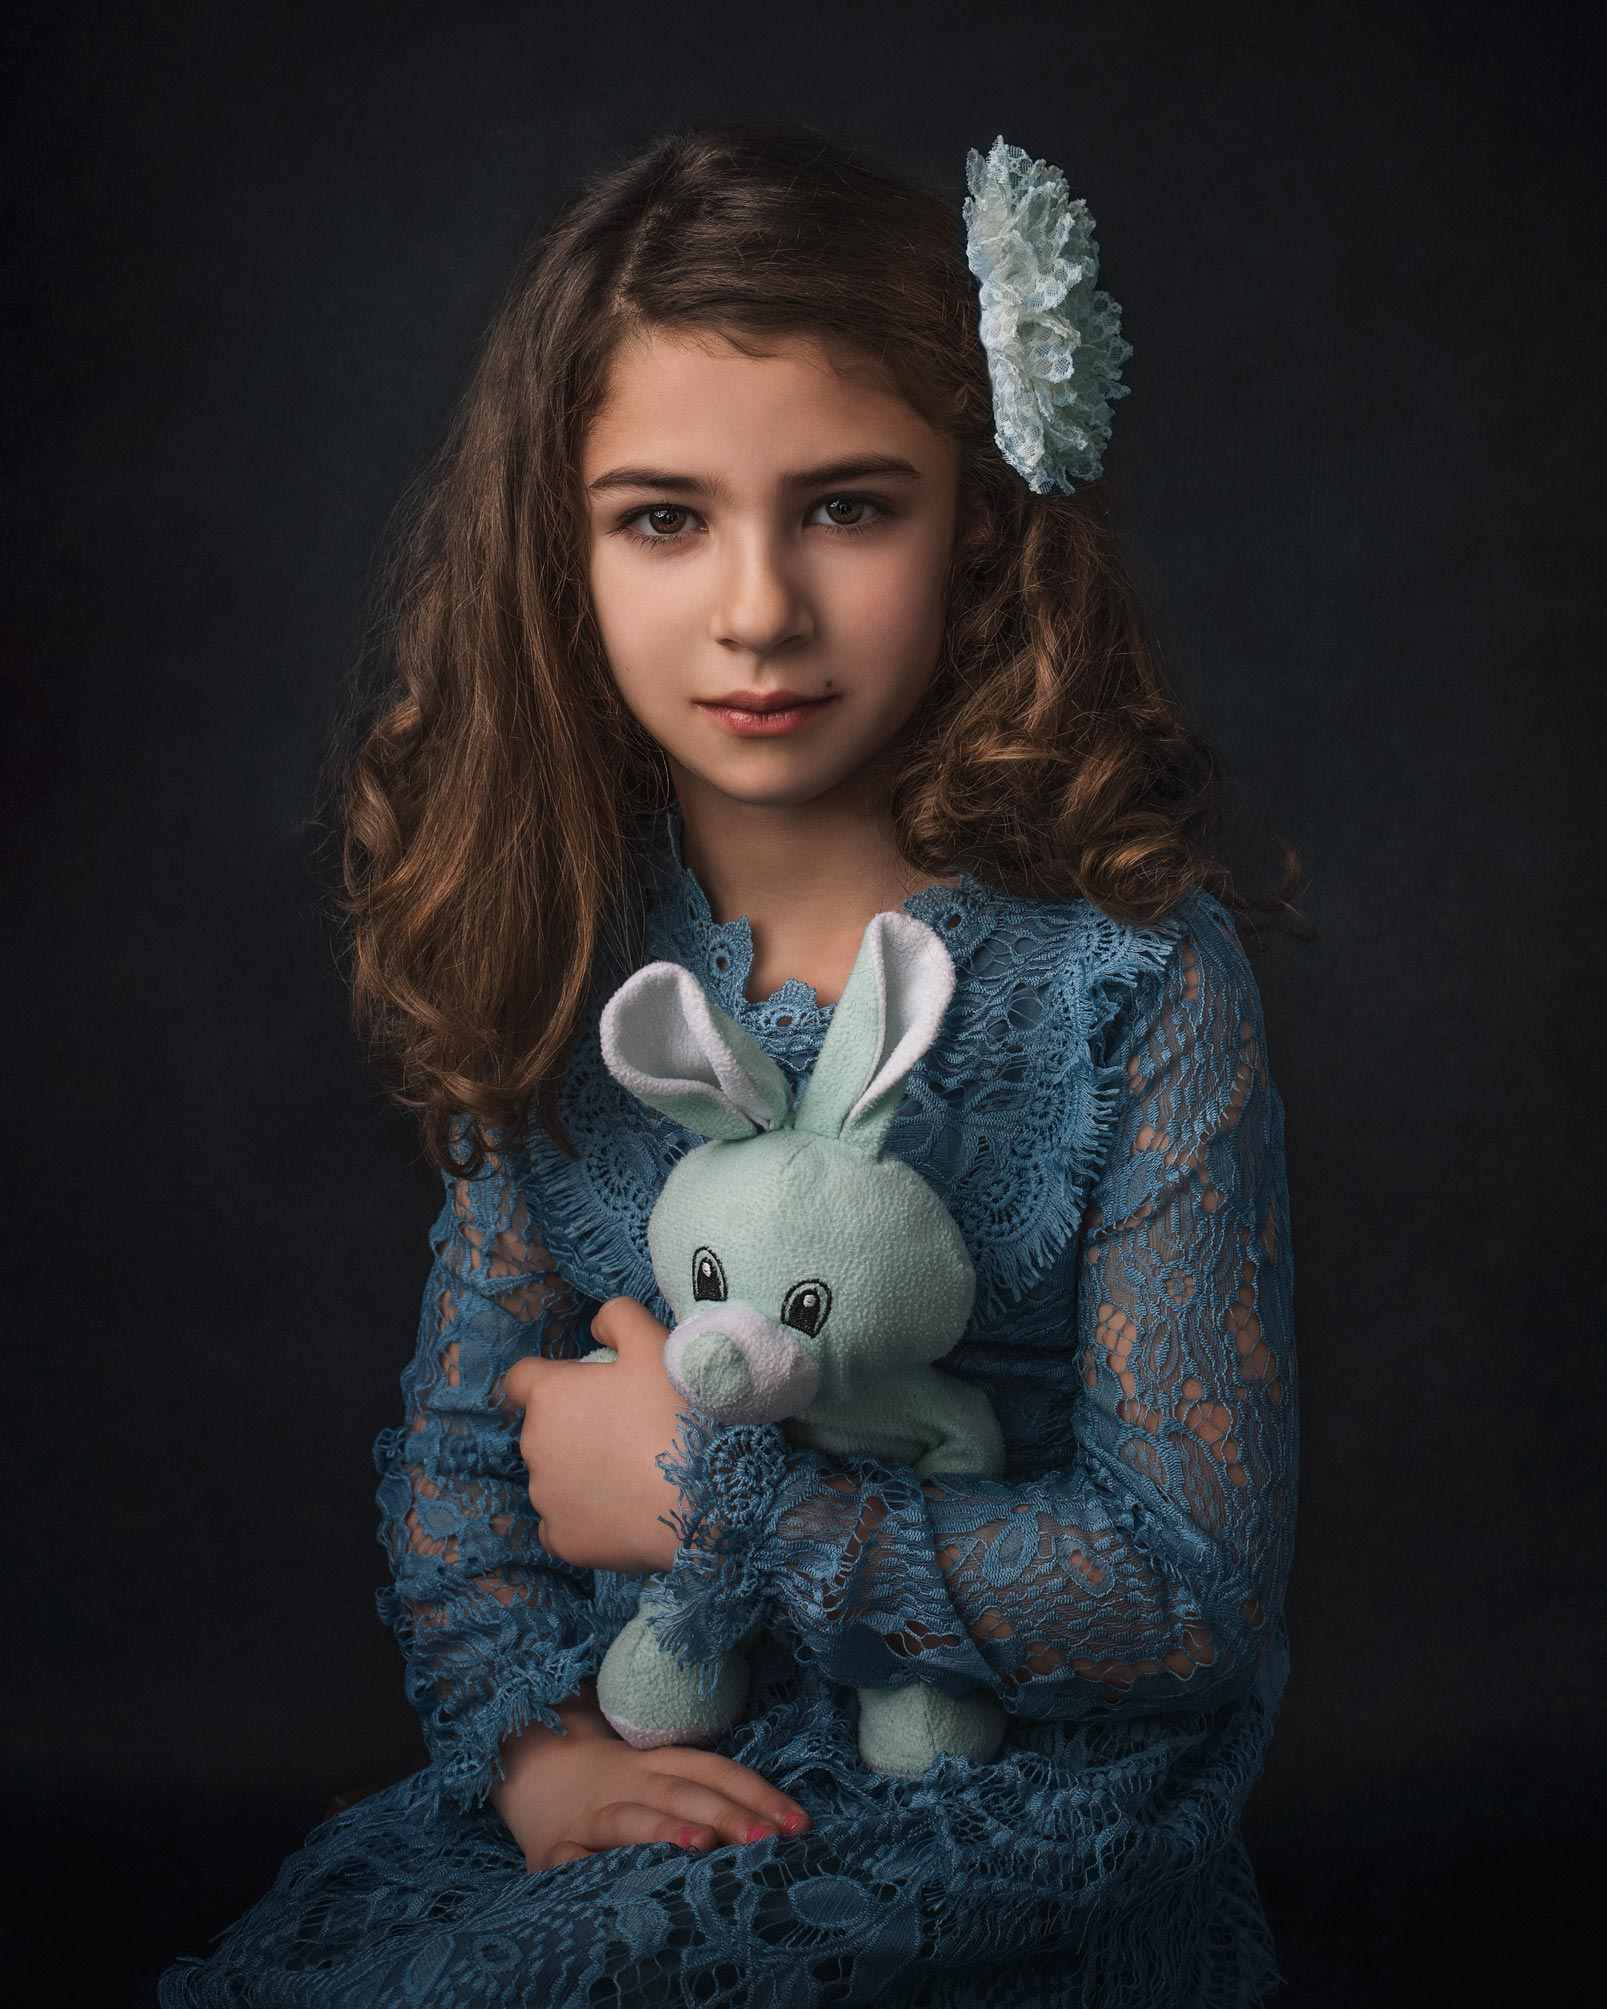 barbara_macferrin_photography_boulder_colorado_80303_fine_art_children_blue_dress_girl_bunny_stuffed_animal.jpg